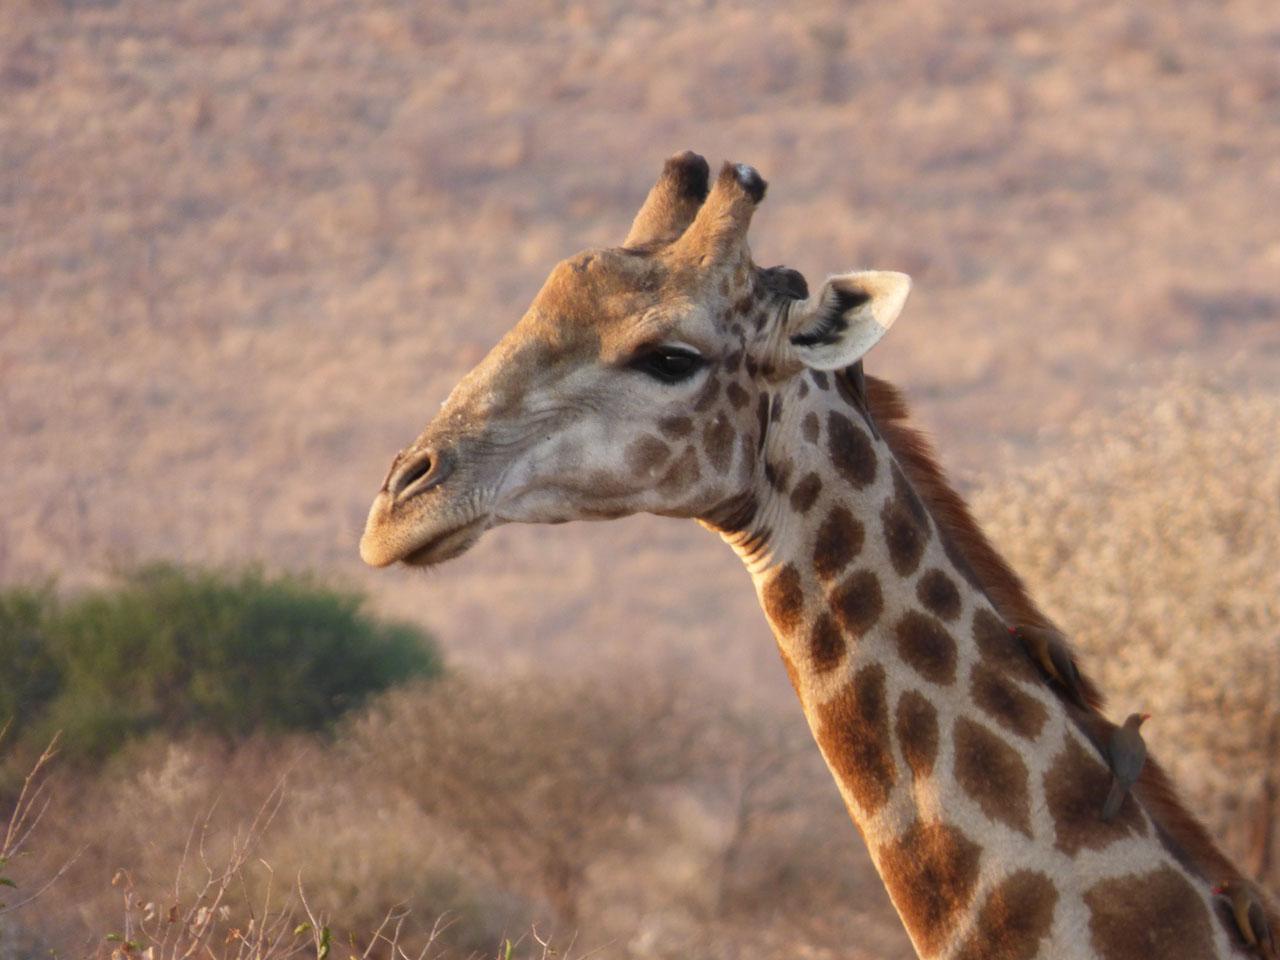 Giraffe in Madikwe Game Reserve, South Africa